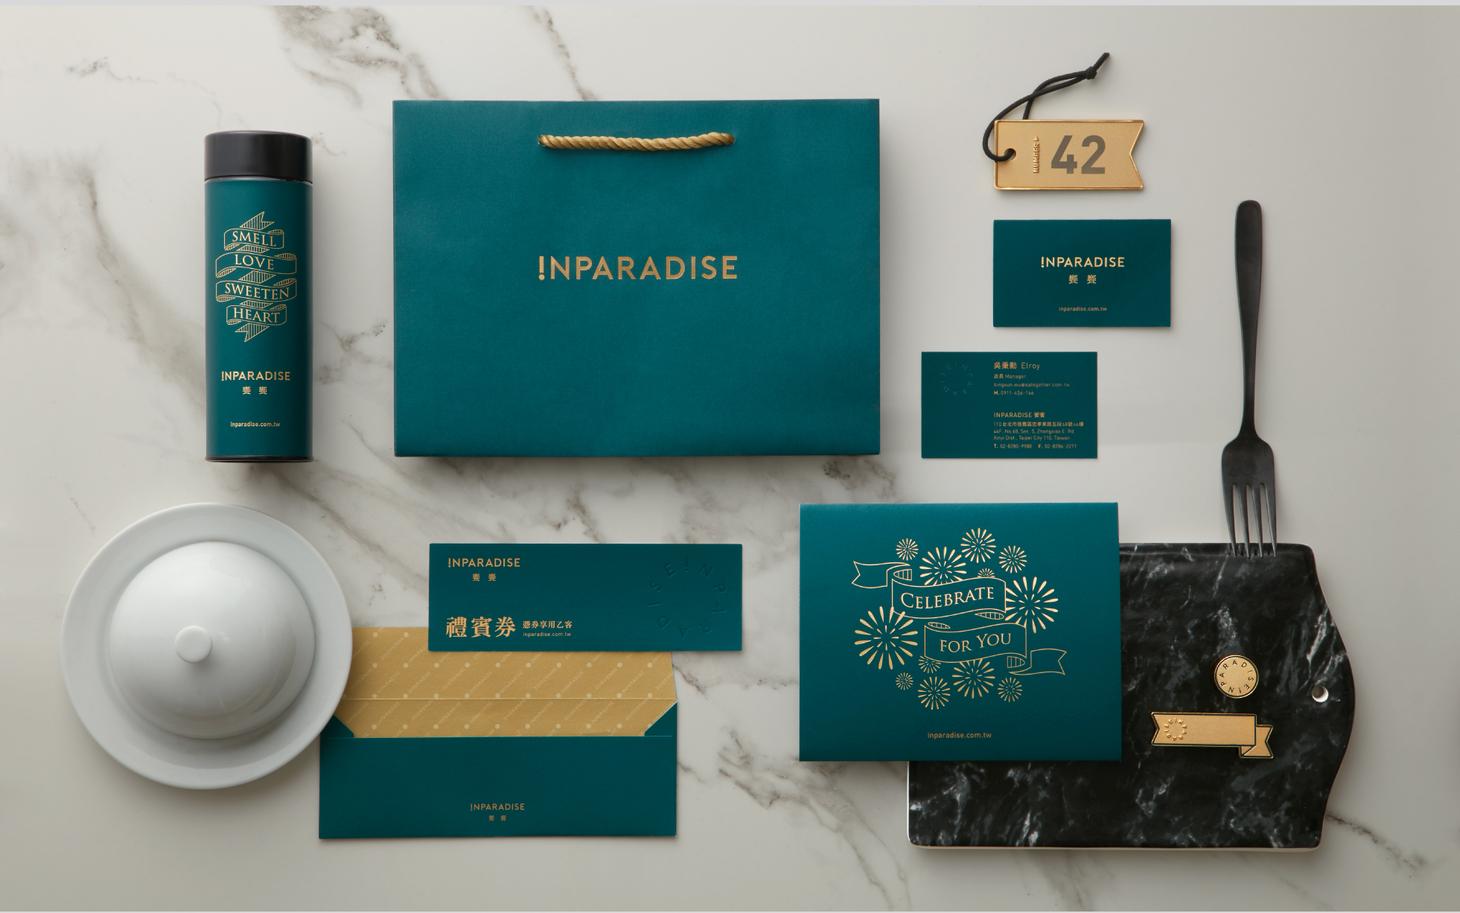 INPARADISE_01.jpg